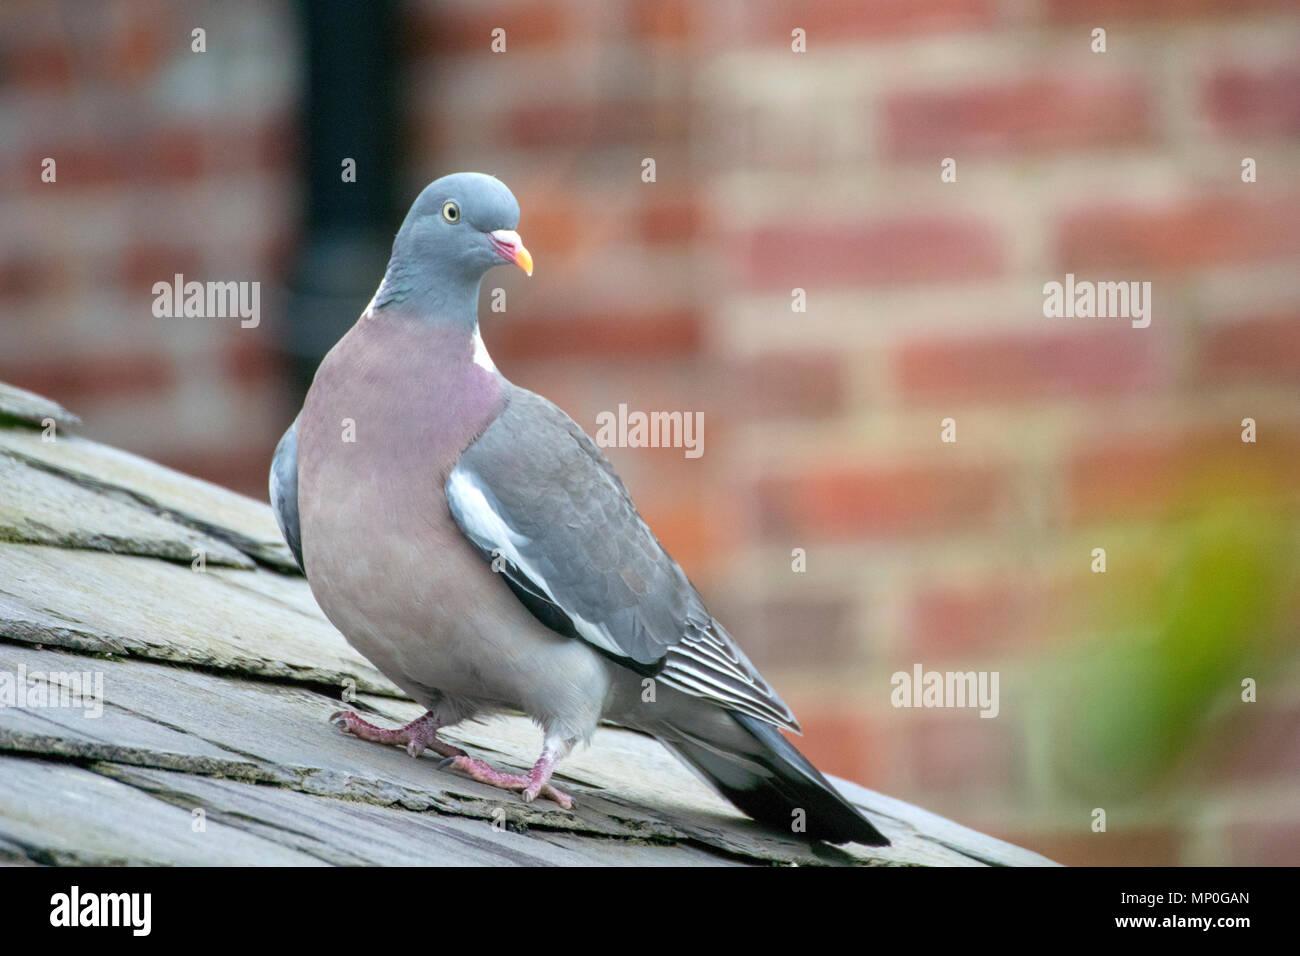 Urban wood pigeon - Stock Image